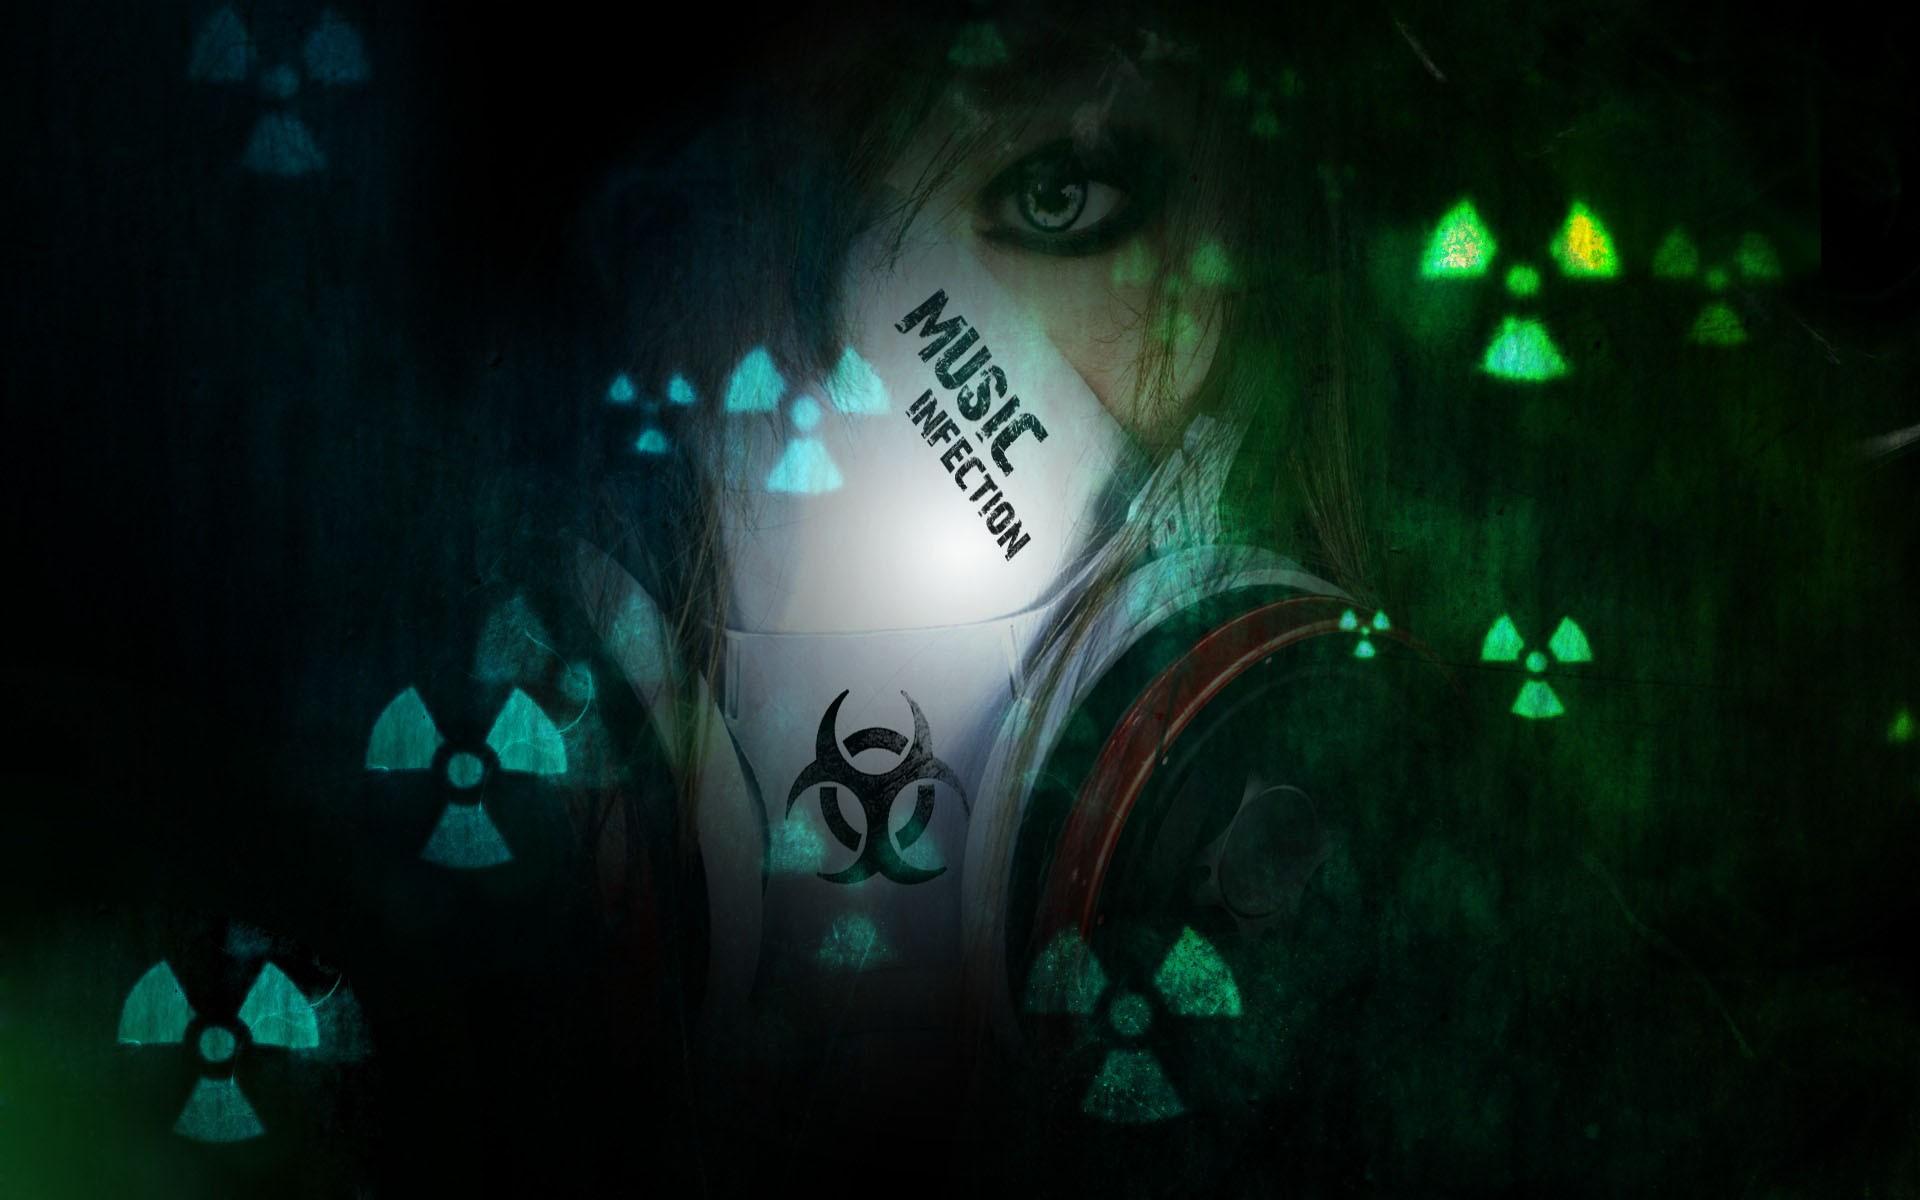 Radioactive Zombie Wallpaper Toxic Mask Wallpaper -...